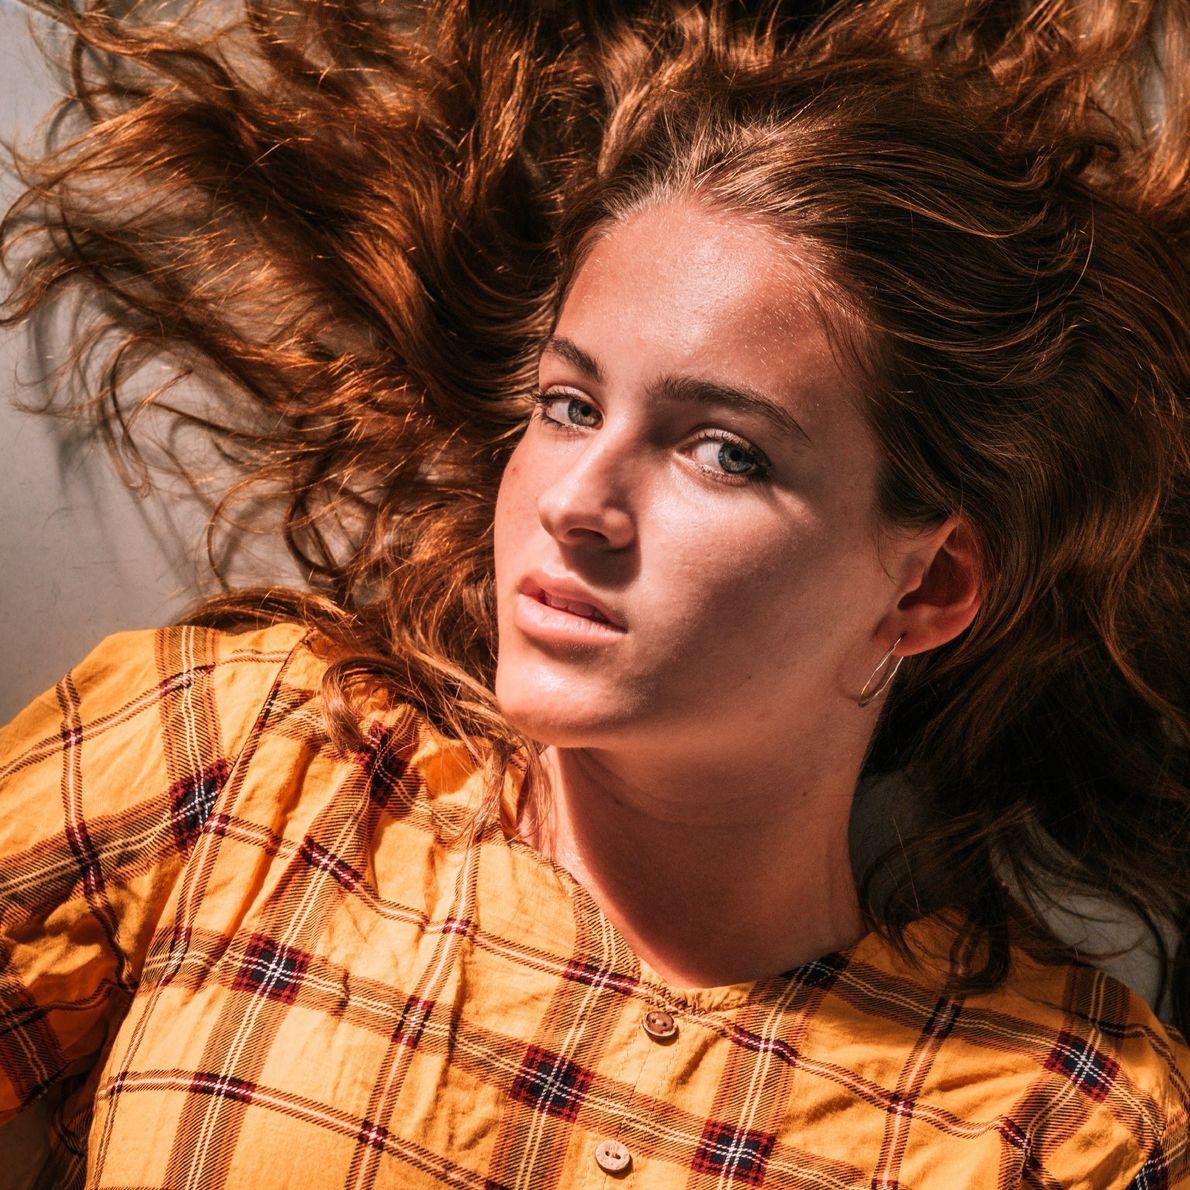 Your Shot photographer Gloria Salgado Gispert made this portrait of her daughter Irene in Perth.